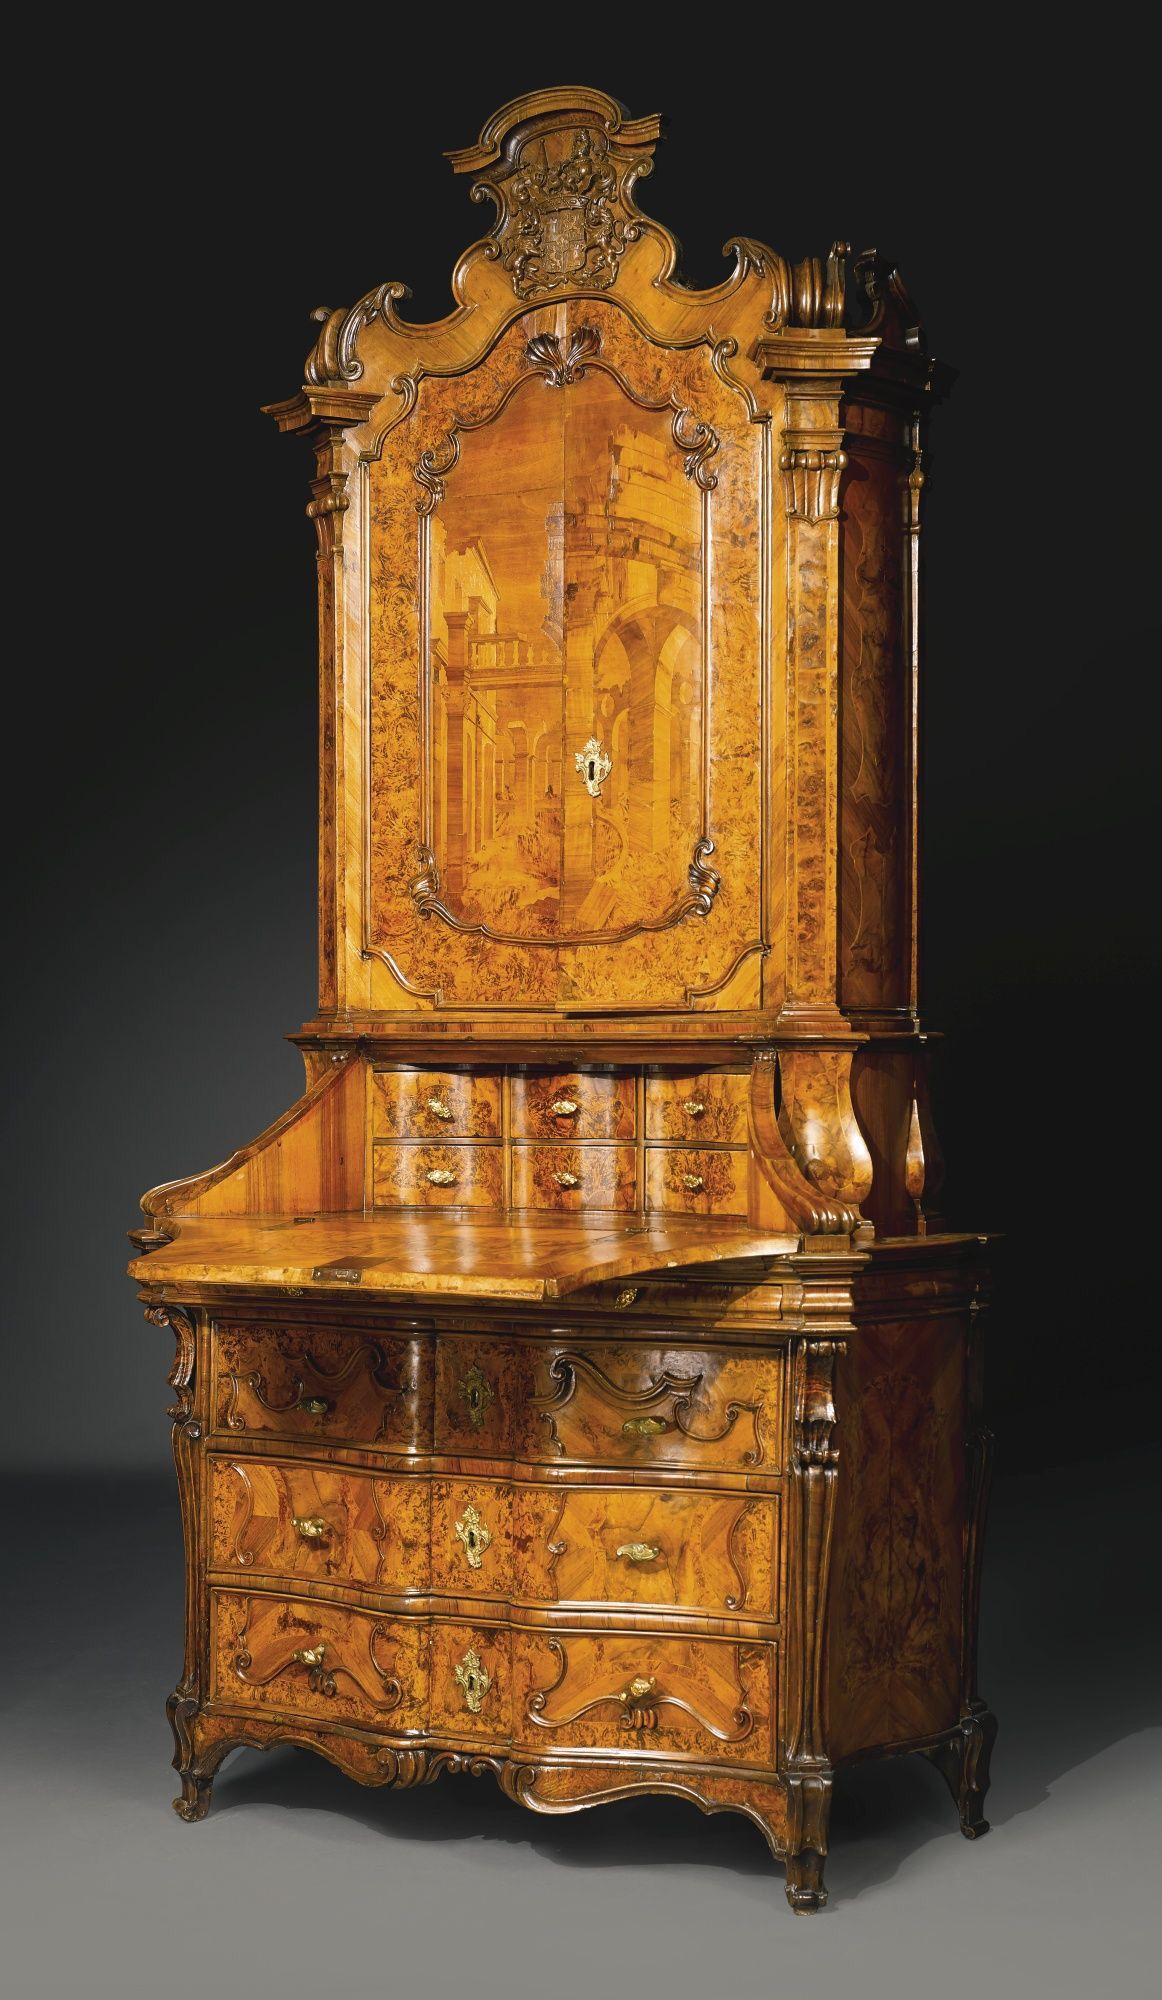 18th century italian boutique chic klkl 7 antik. Black Bedroom Furniture Sets. Home Design Ideas